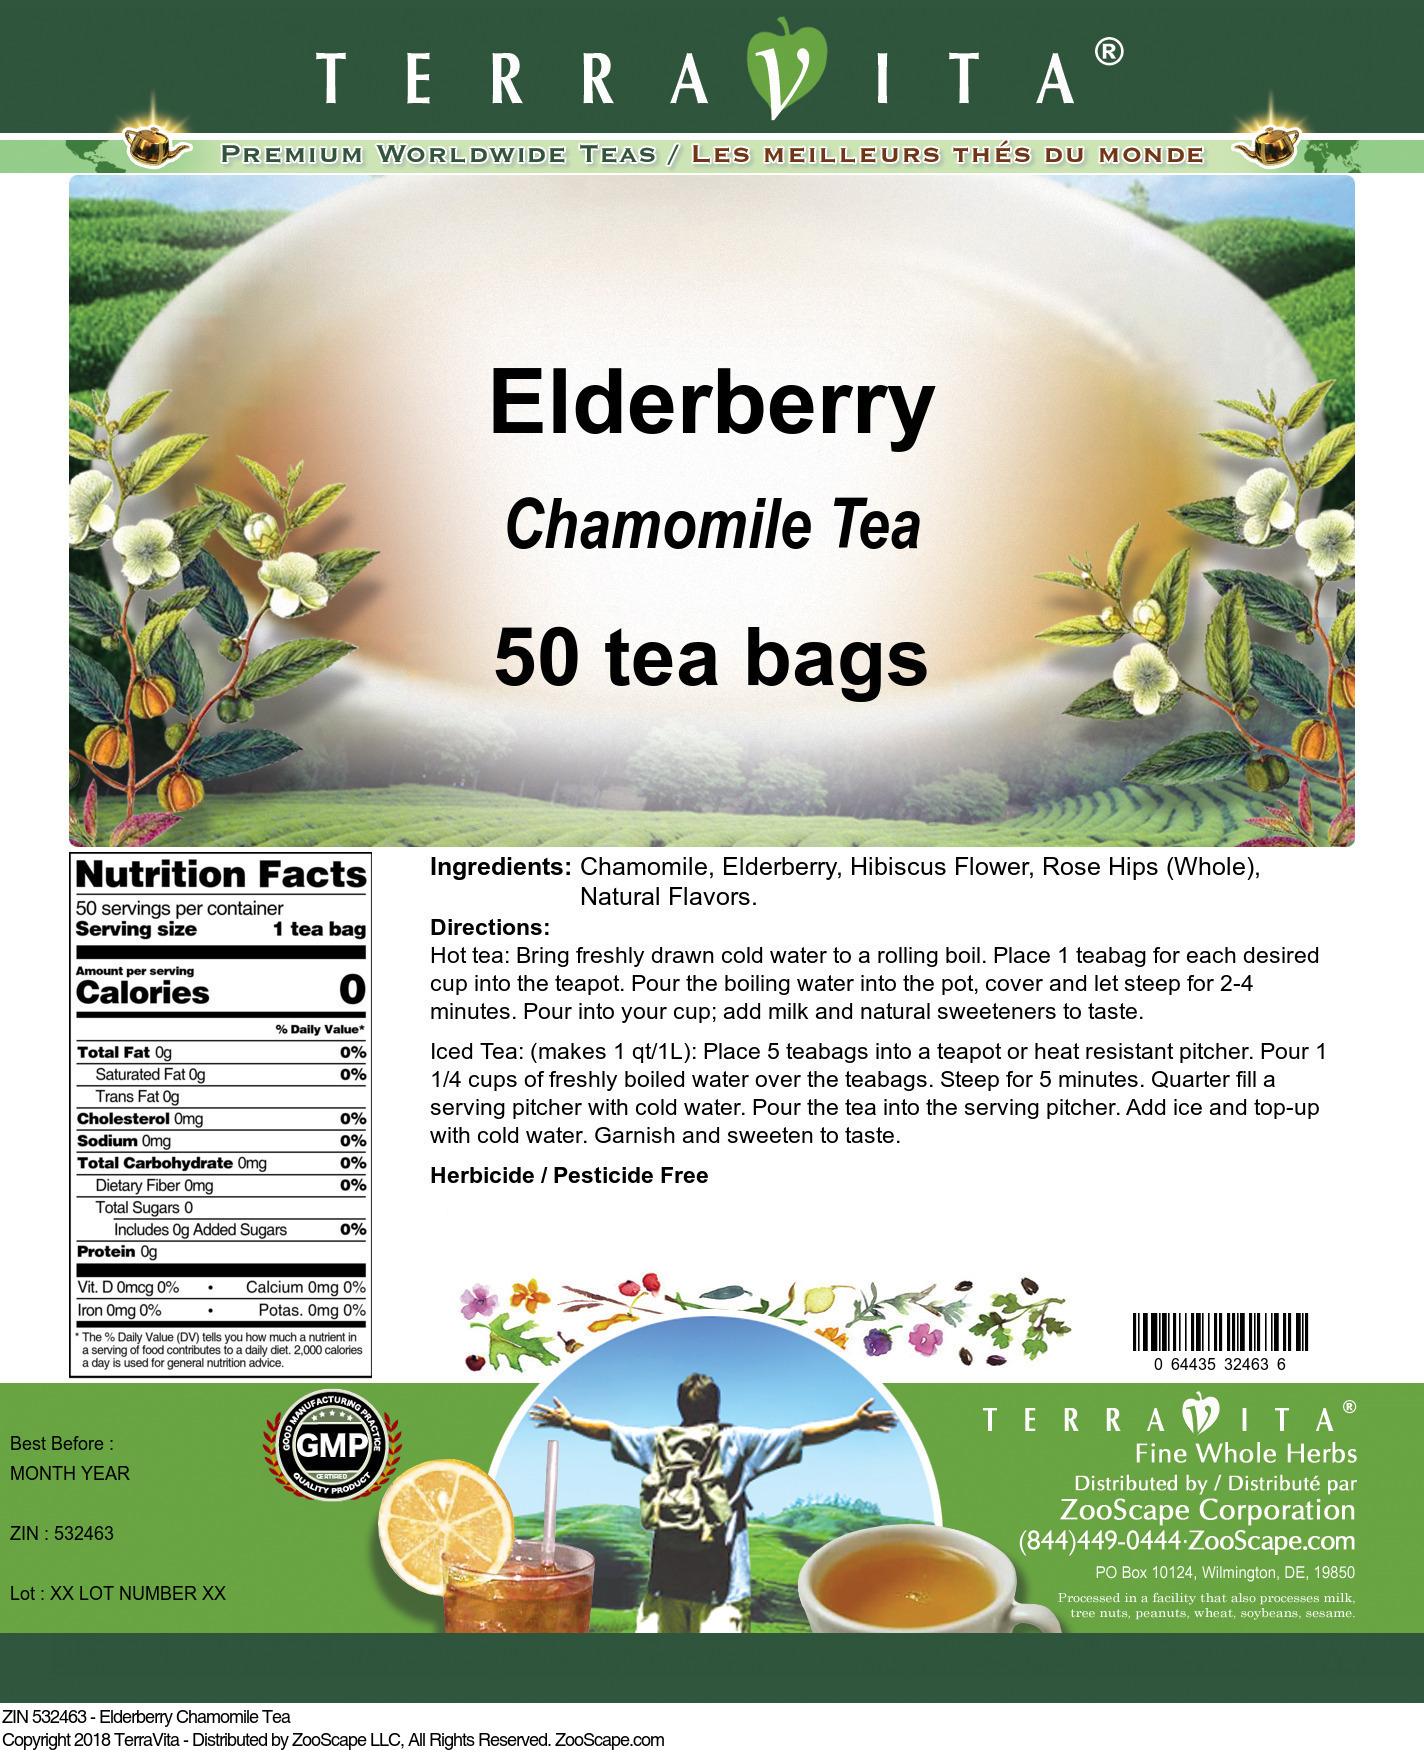 Elderberry Chamomile Tea